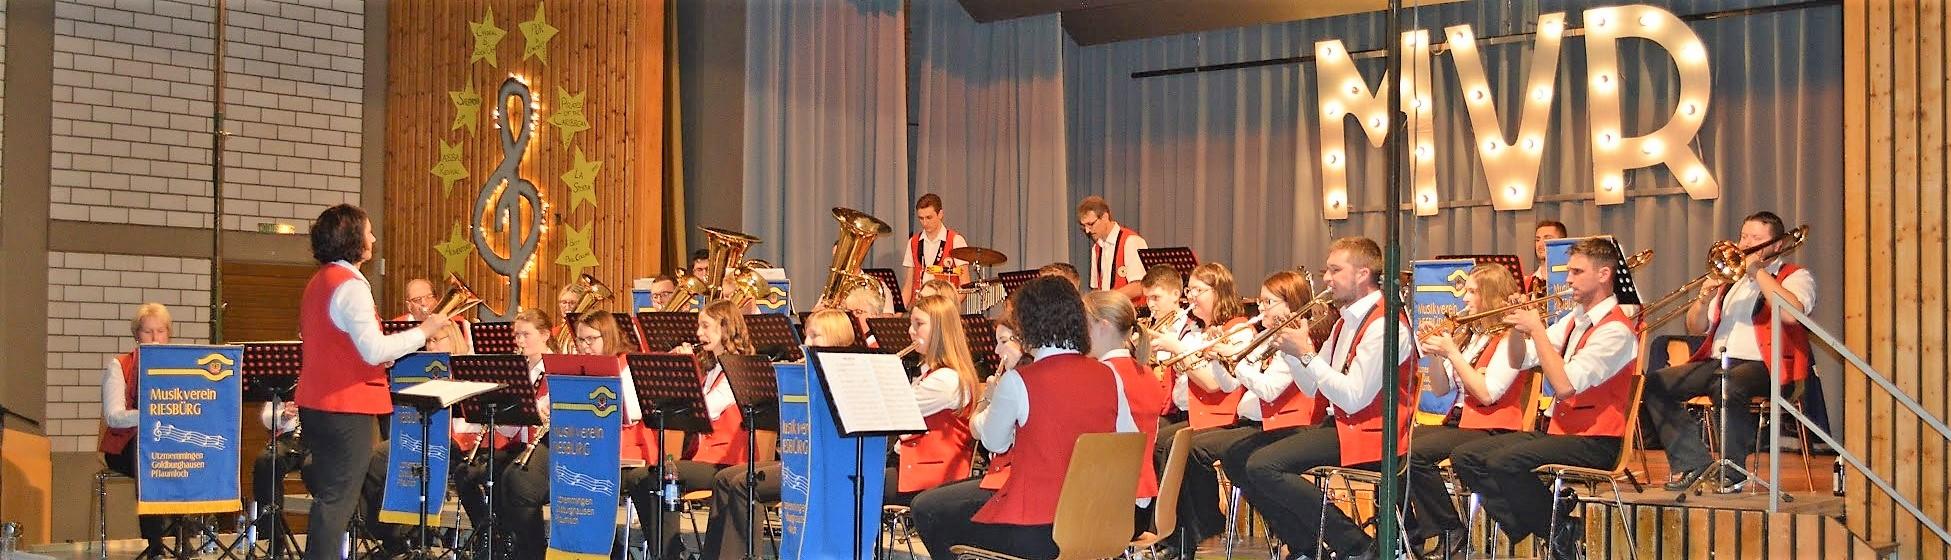 Musikverein Riesbürg e.V.